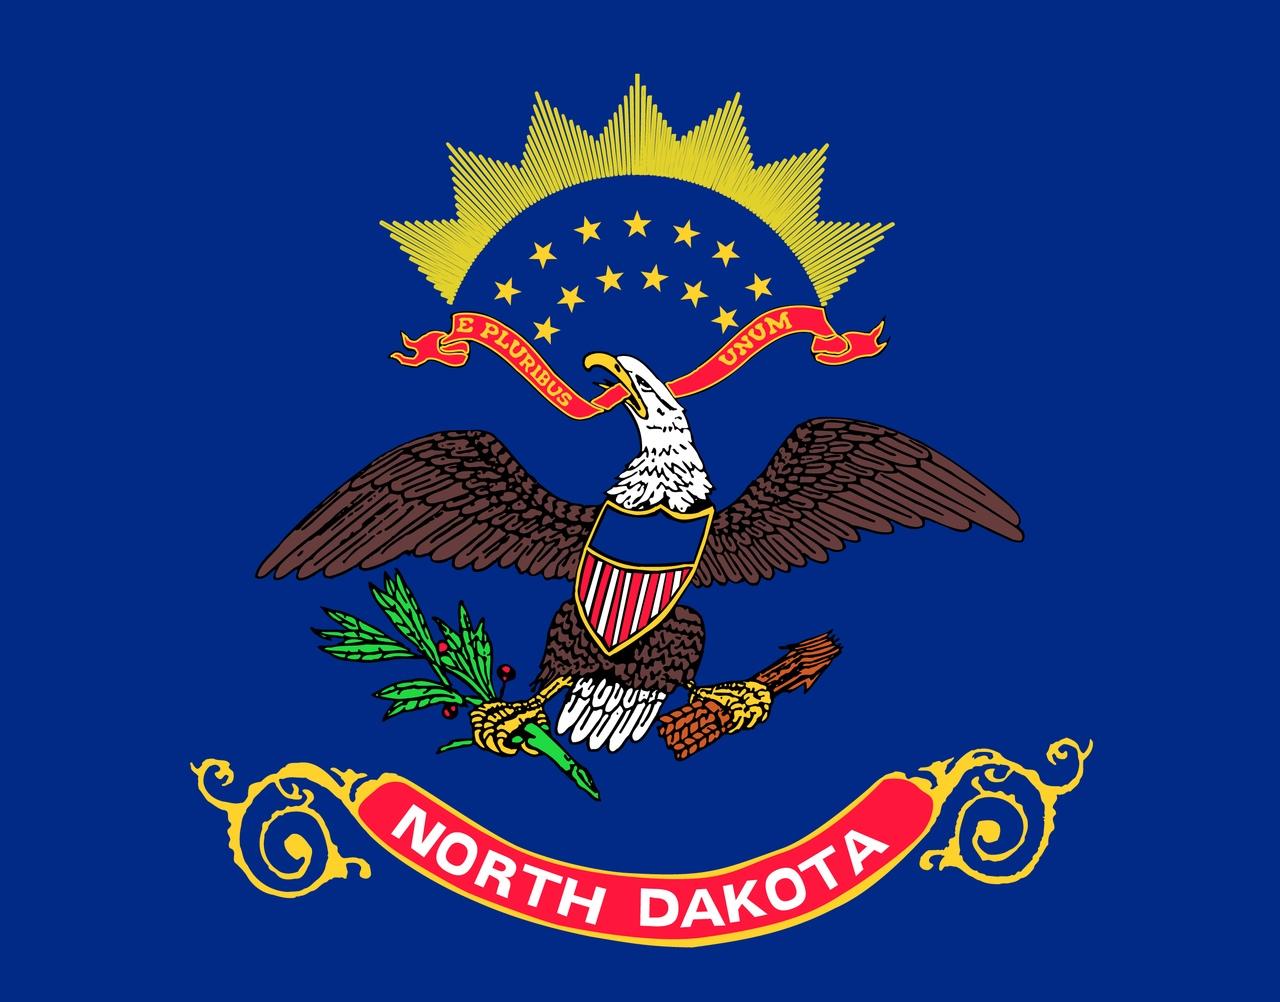 Флаг Северная Дакота